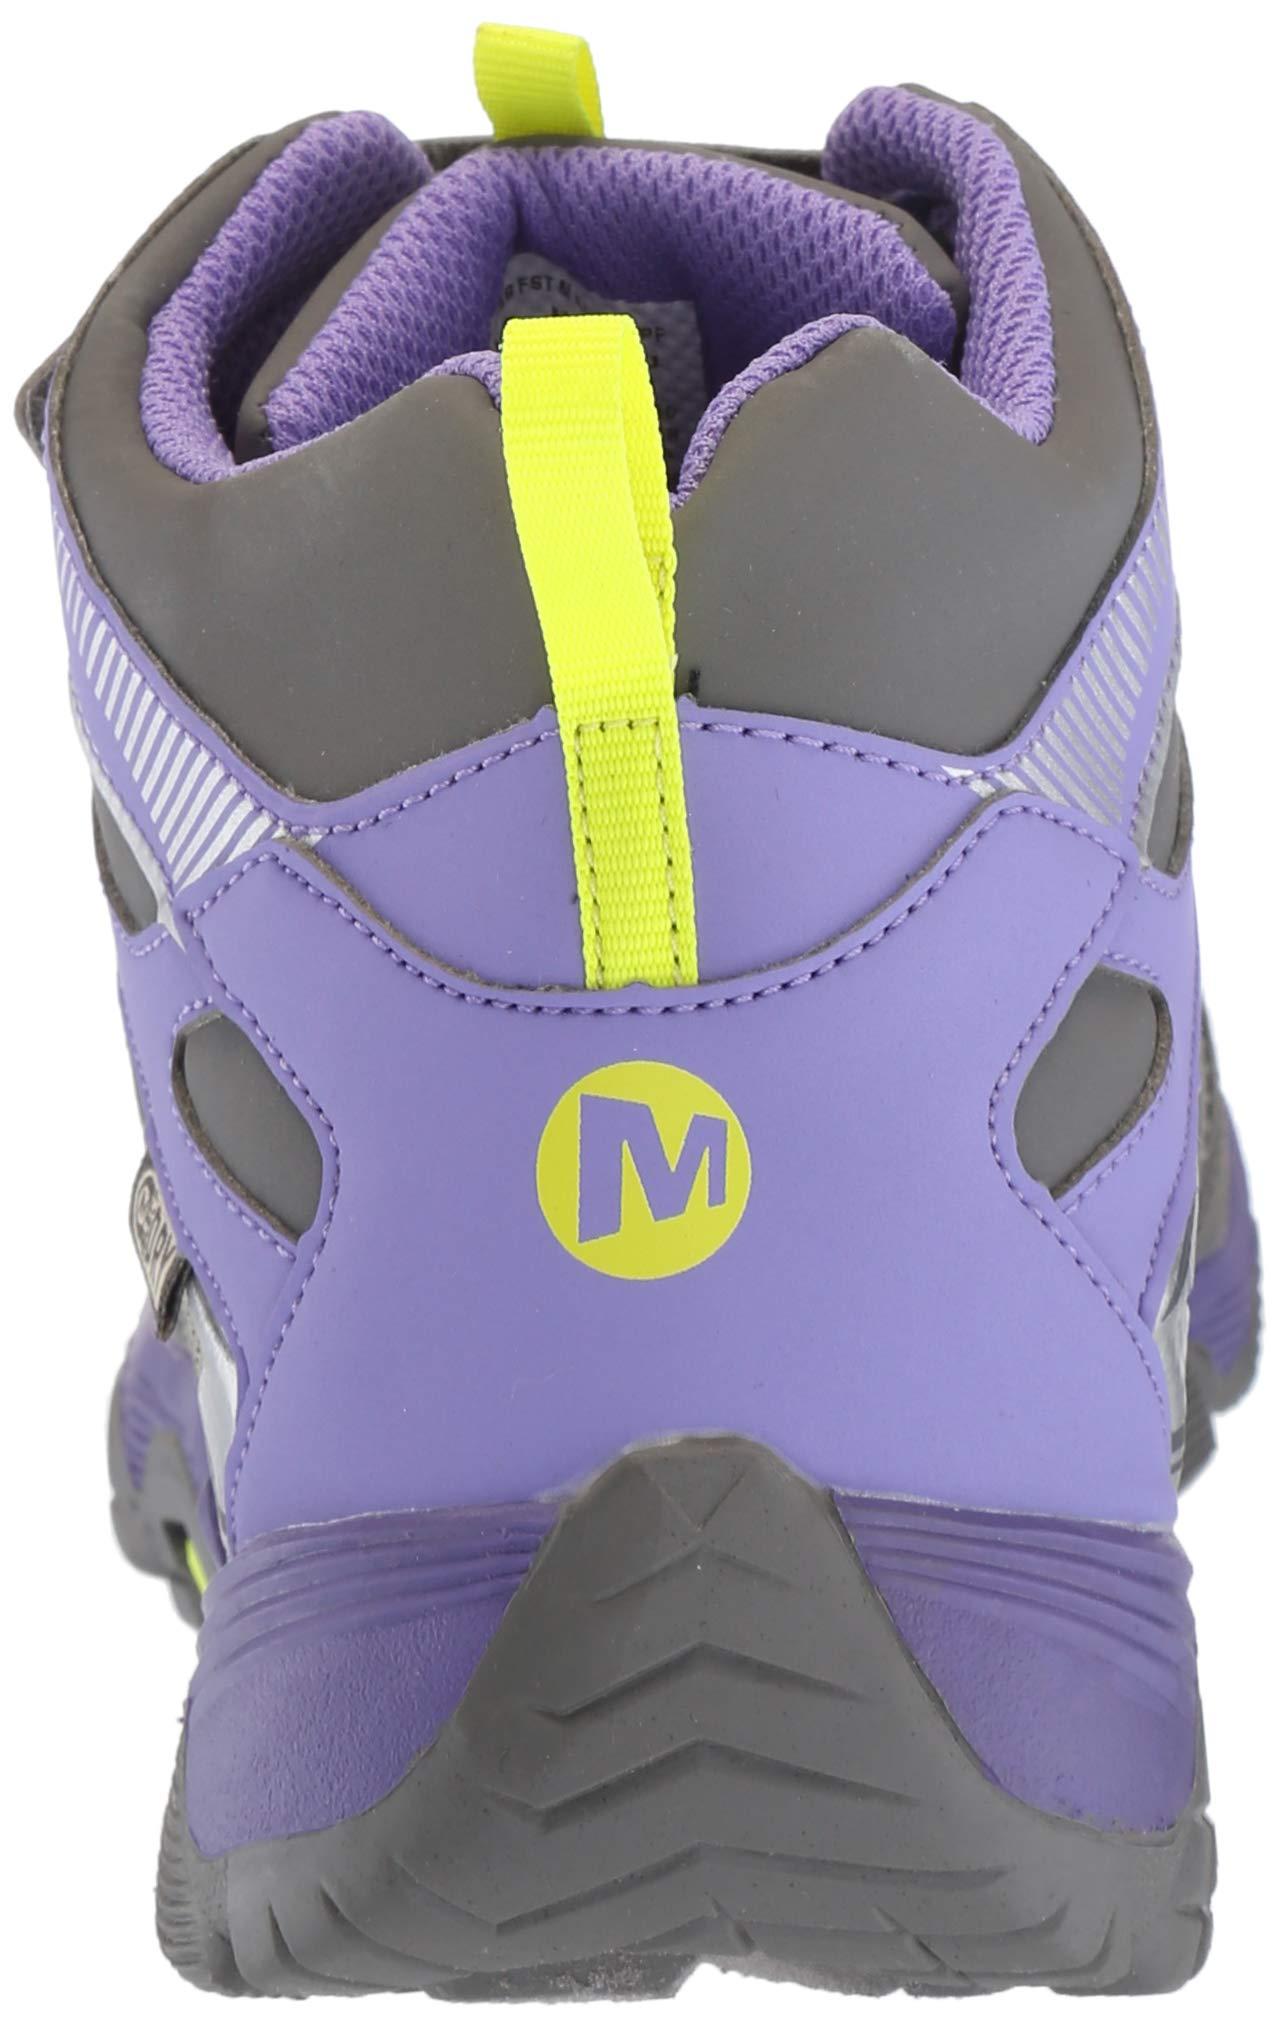 Merrell Girls' Moab FST Mid A/C WTRPF Hiking Shoe, Grey/Purple, 3.5 Medium US Big Kid by Merrell (Image #2)